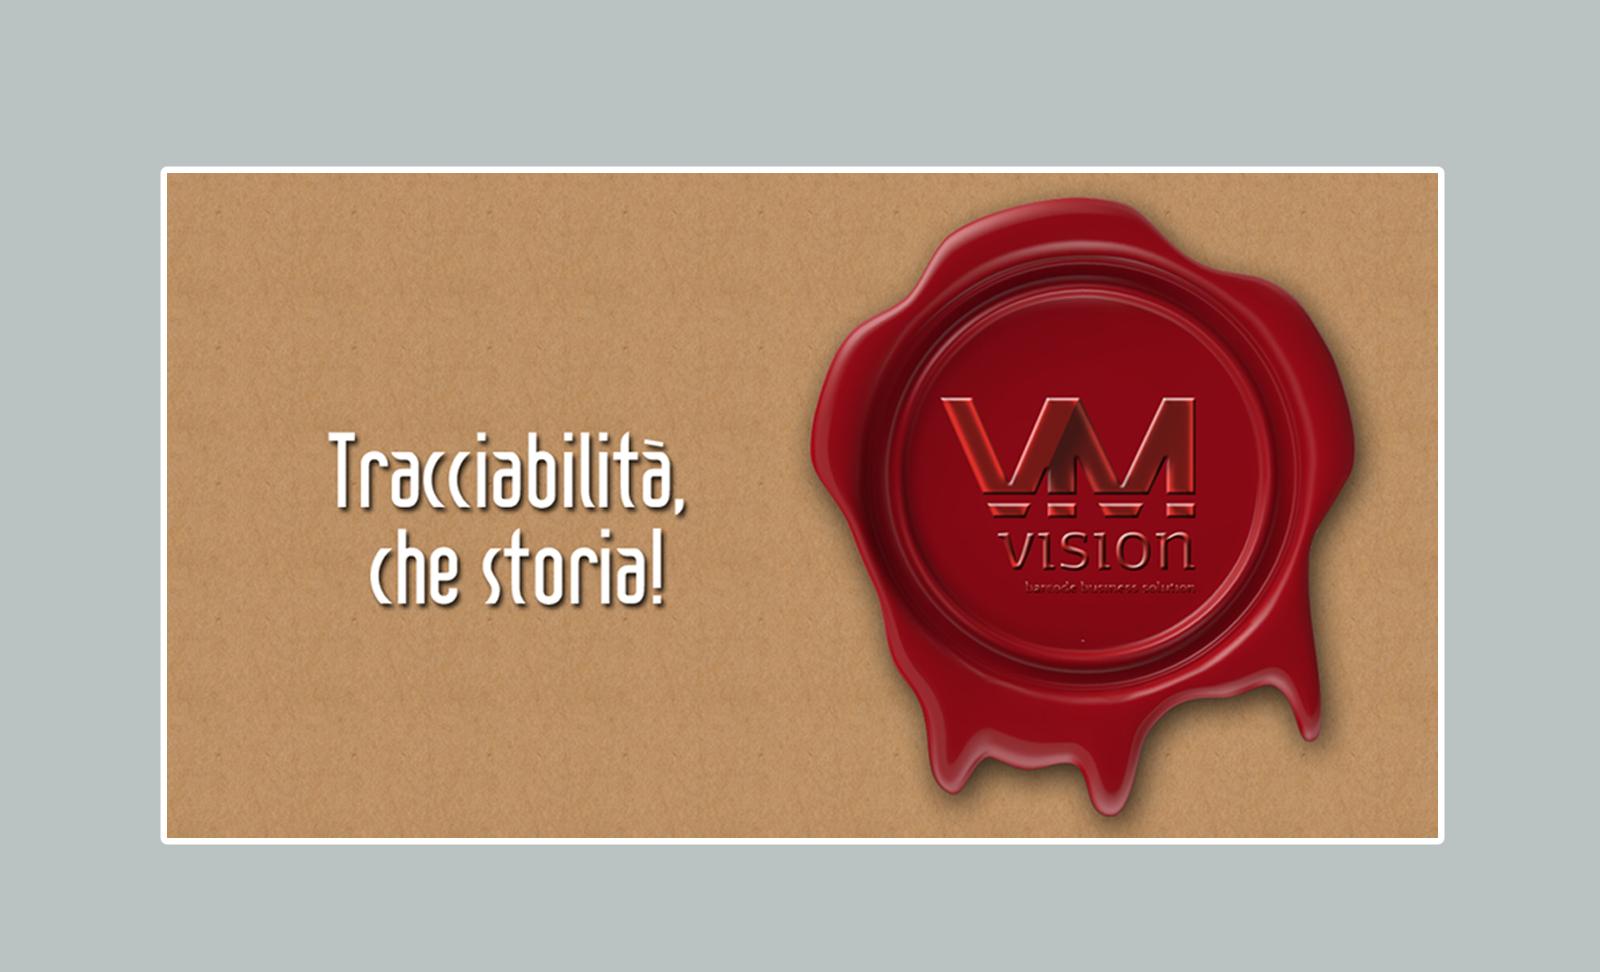 VM Vision – Campagna Linkedin Tracciabilità